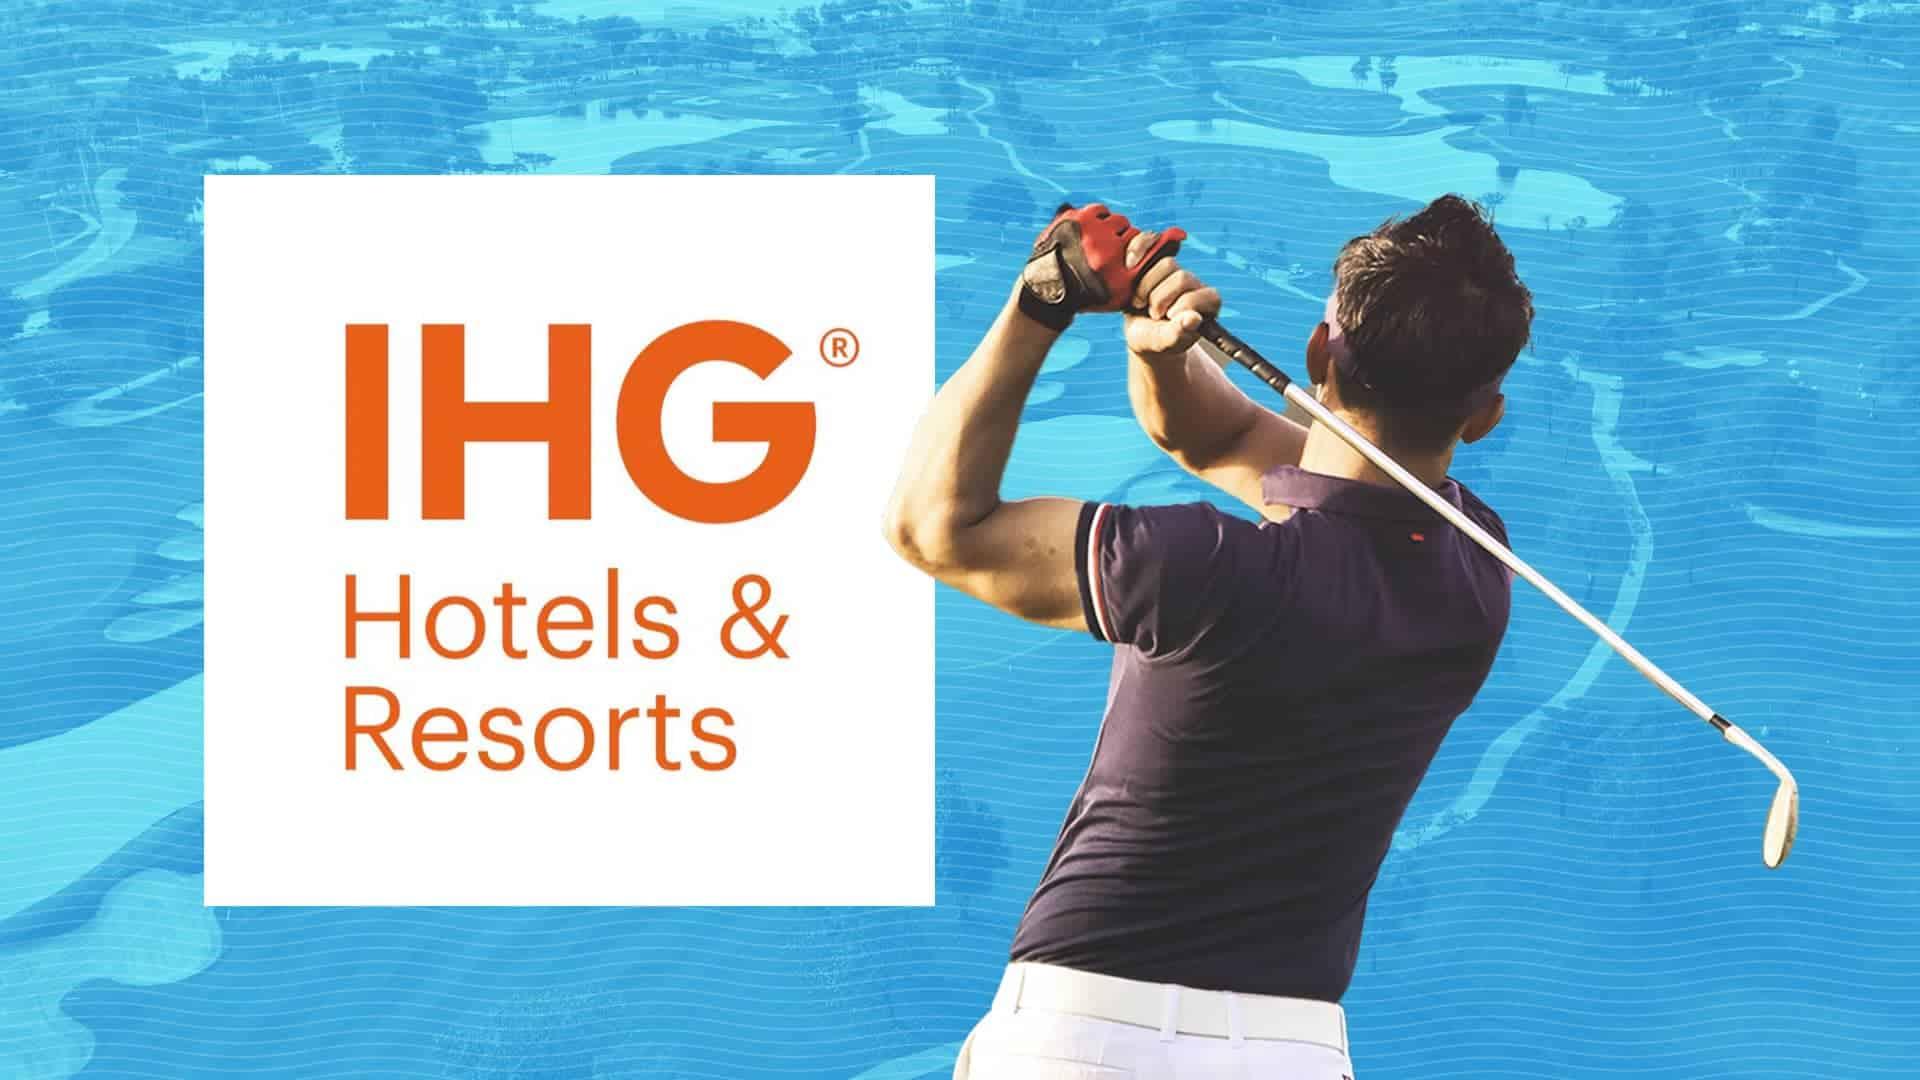 IHG Golf Hotels and Resorts